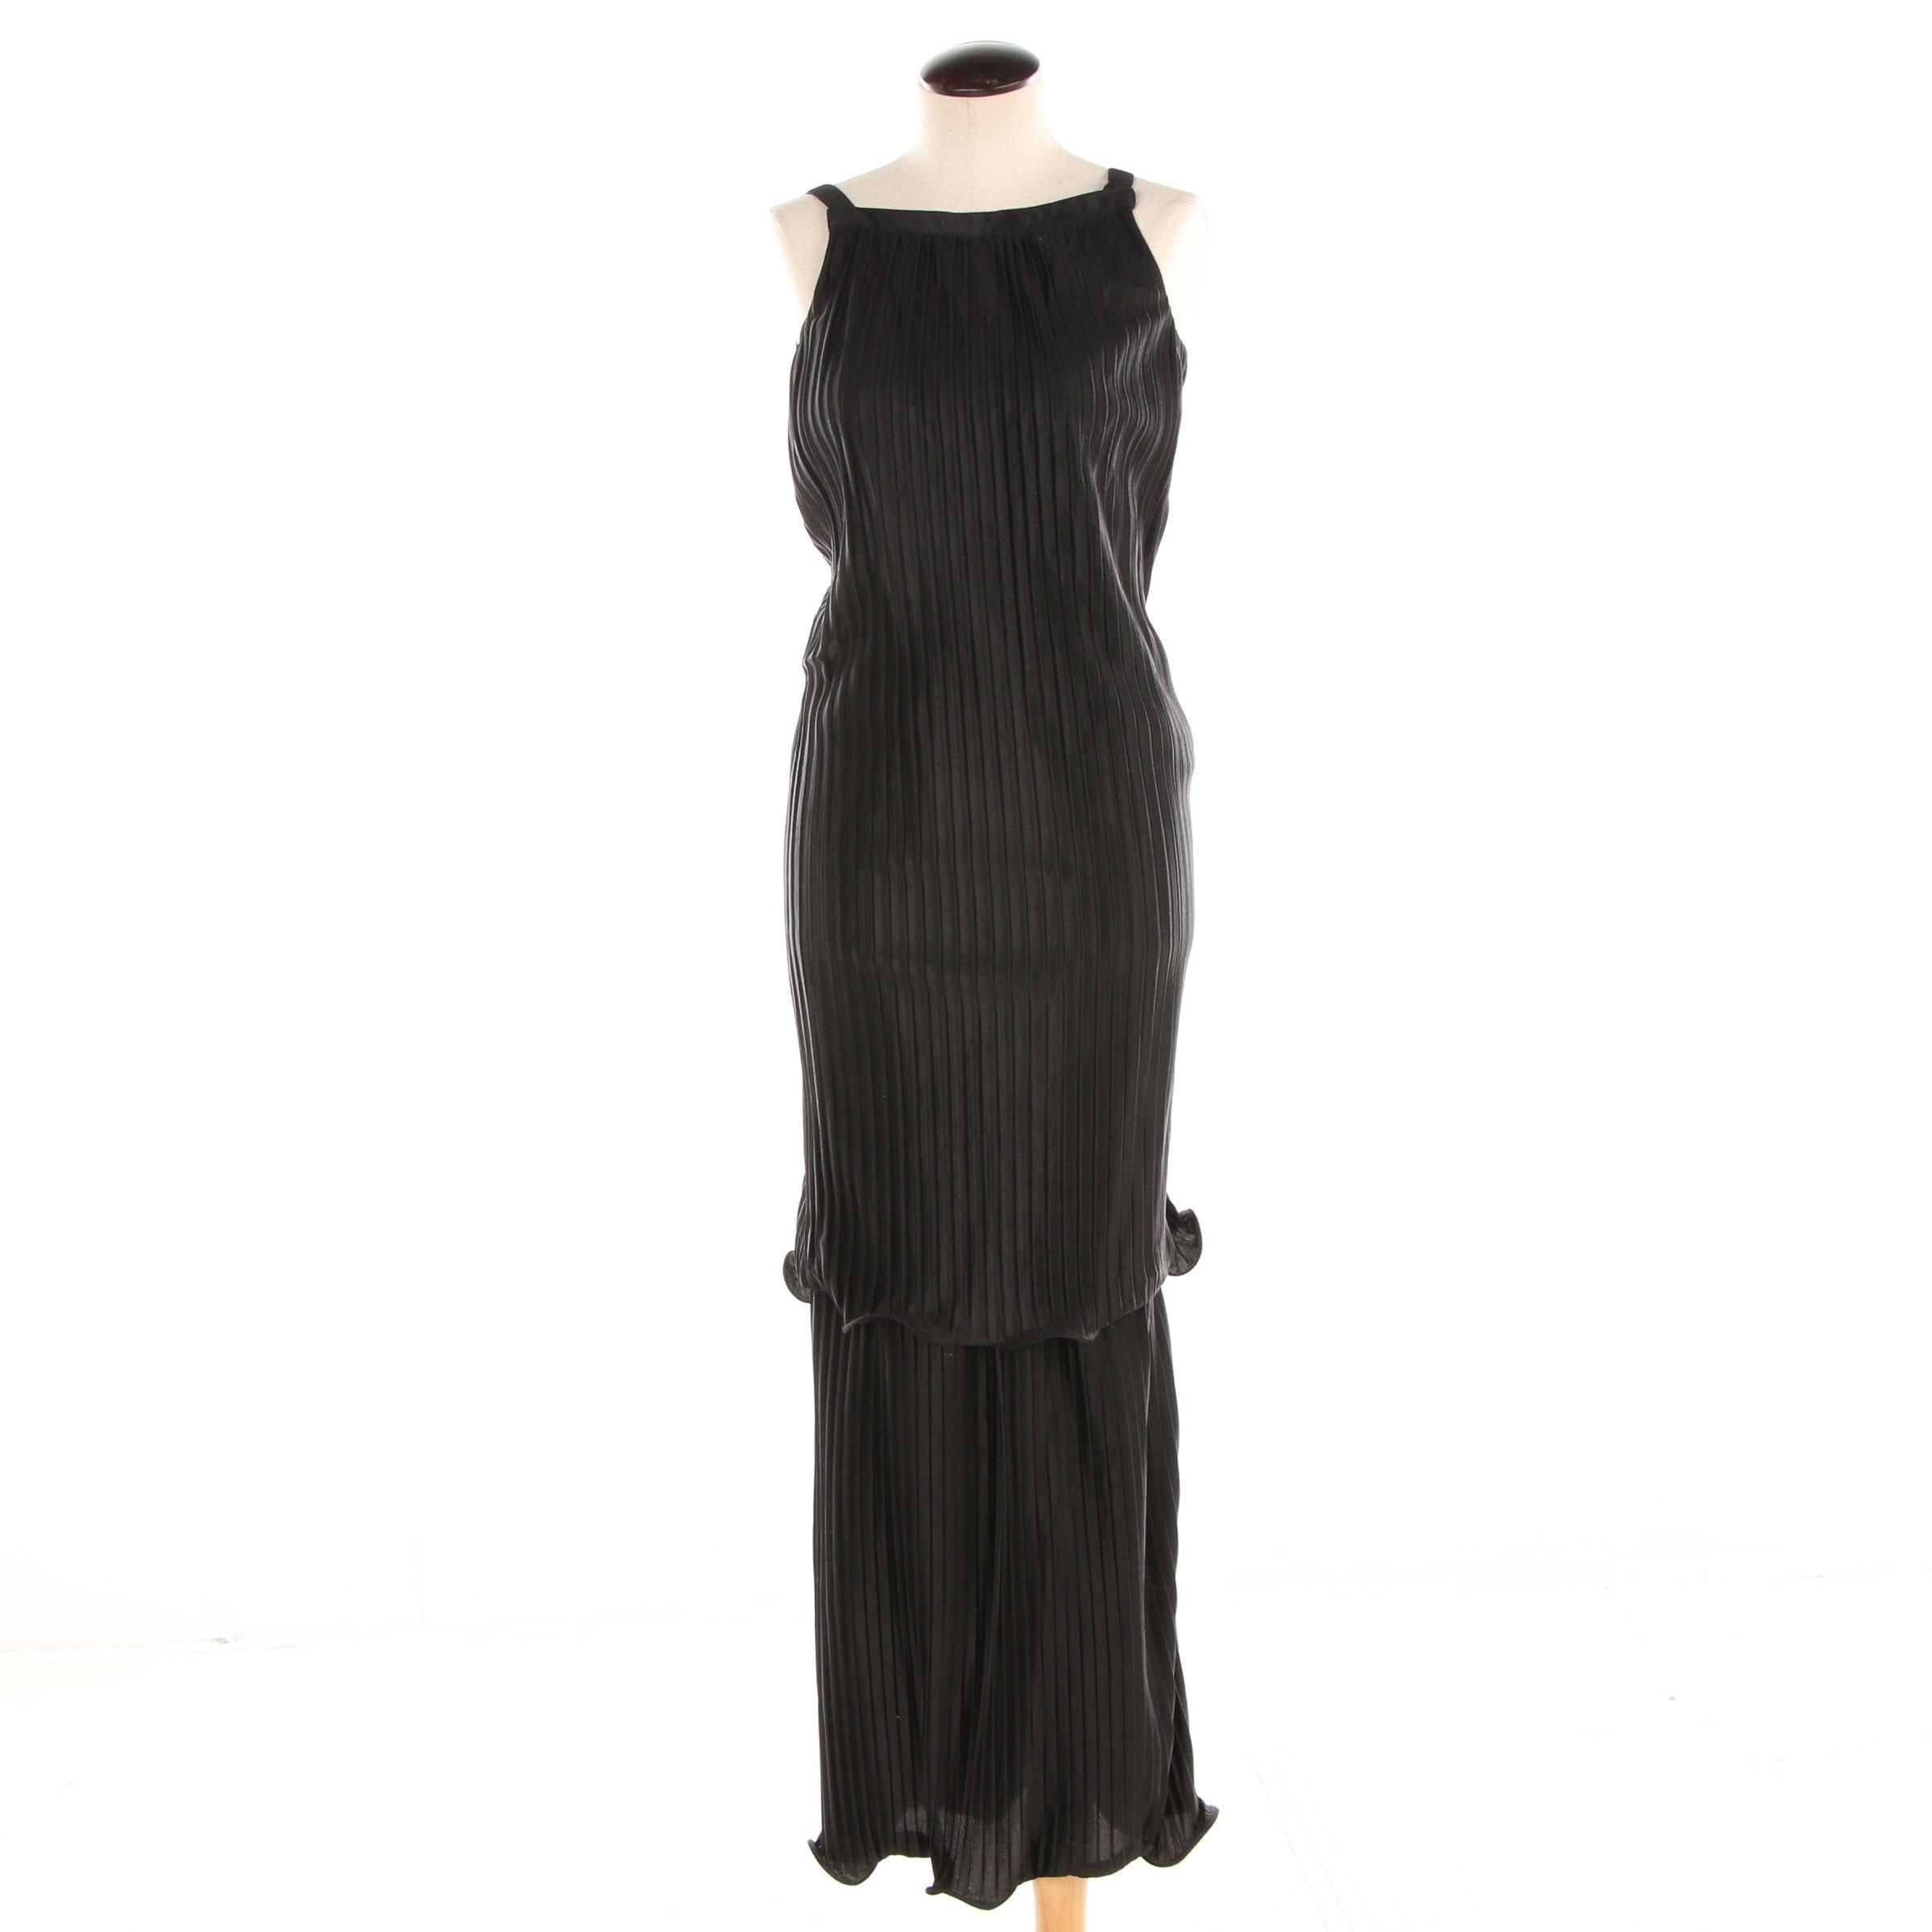 Circa 1970s Courréges Paris Black Plisse Overlay Sleeveless Maxi Dress